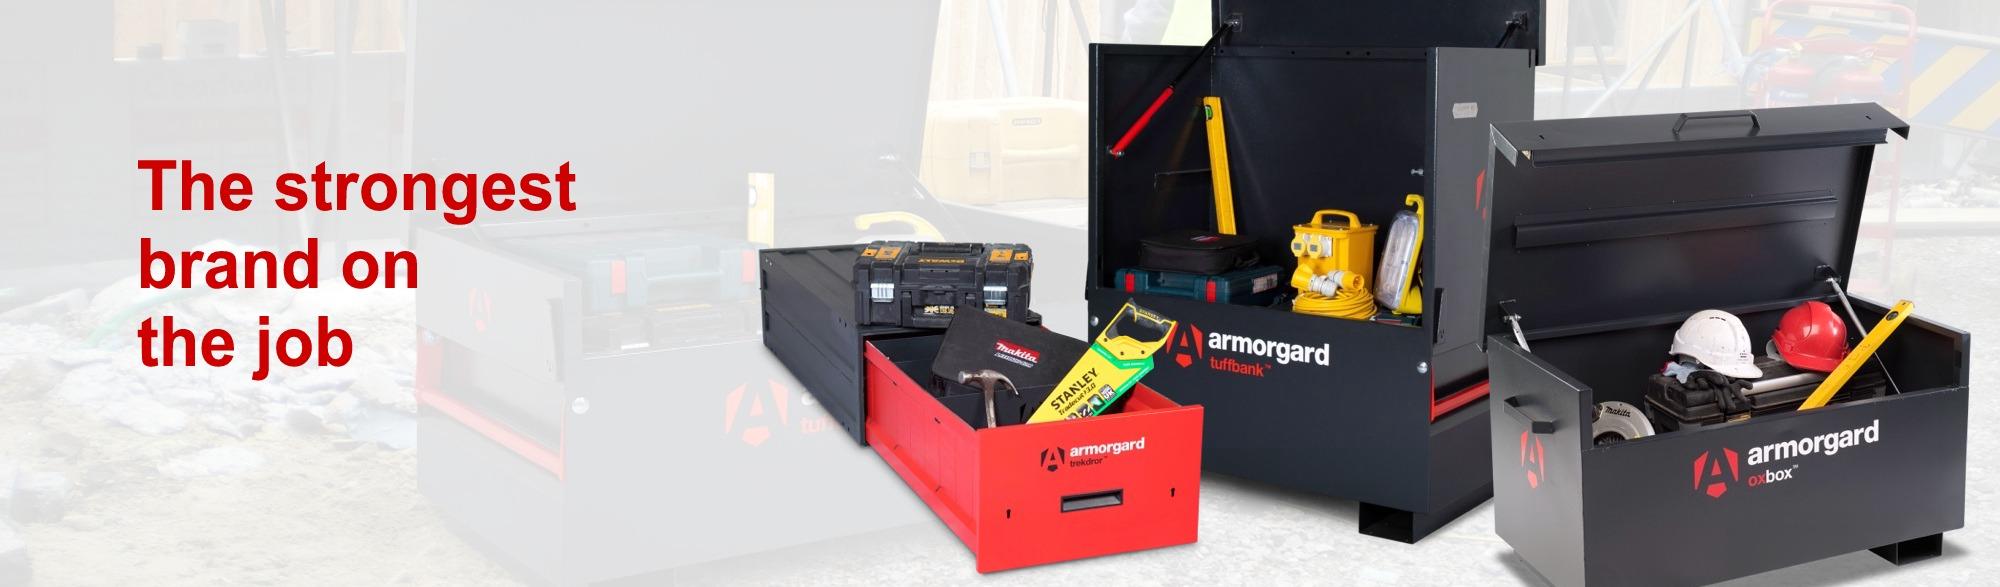 tool battery charging storage site van box locker